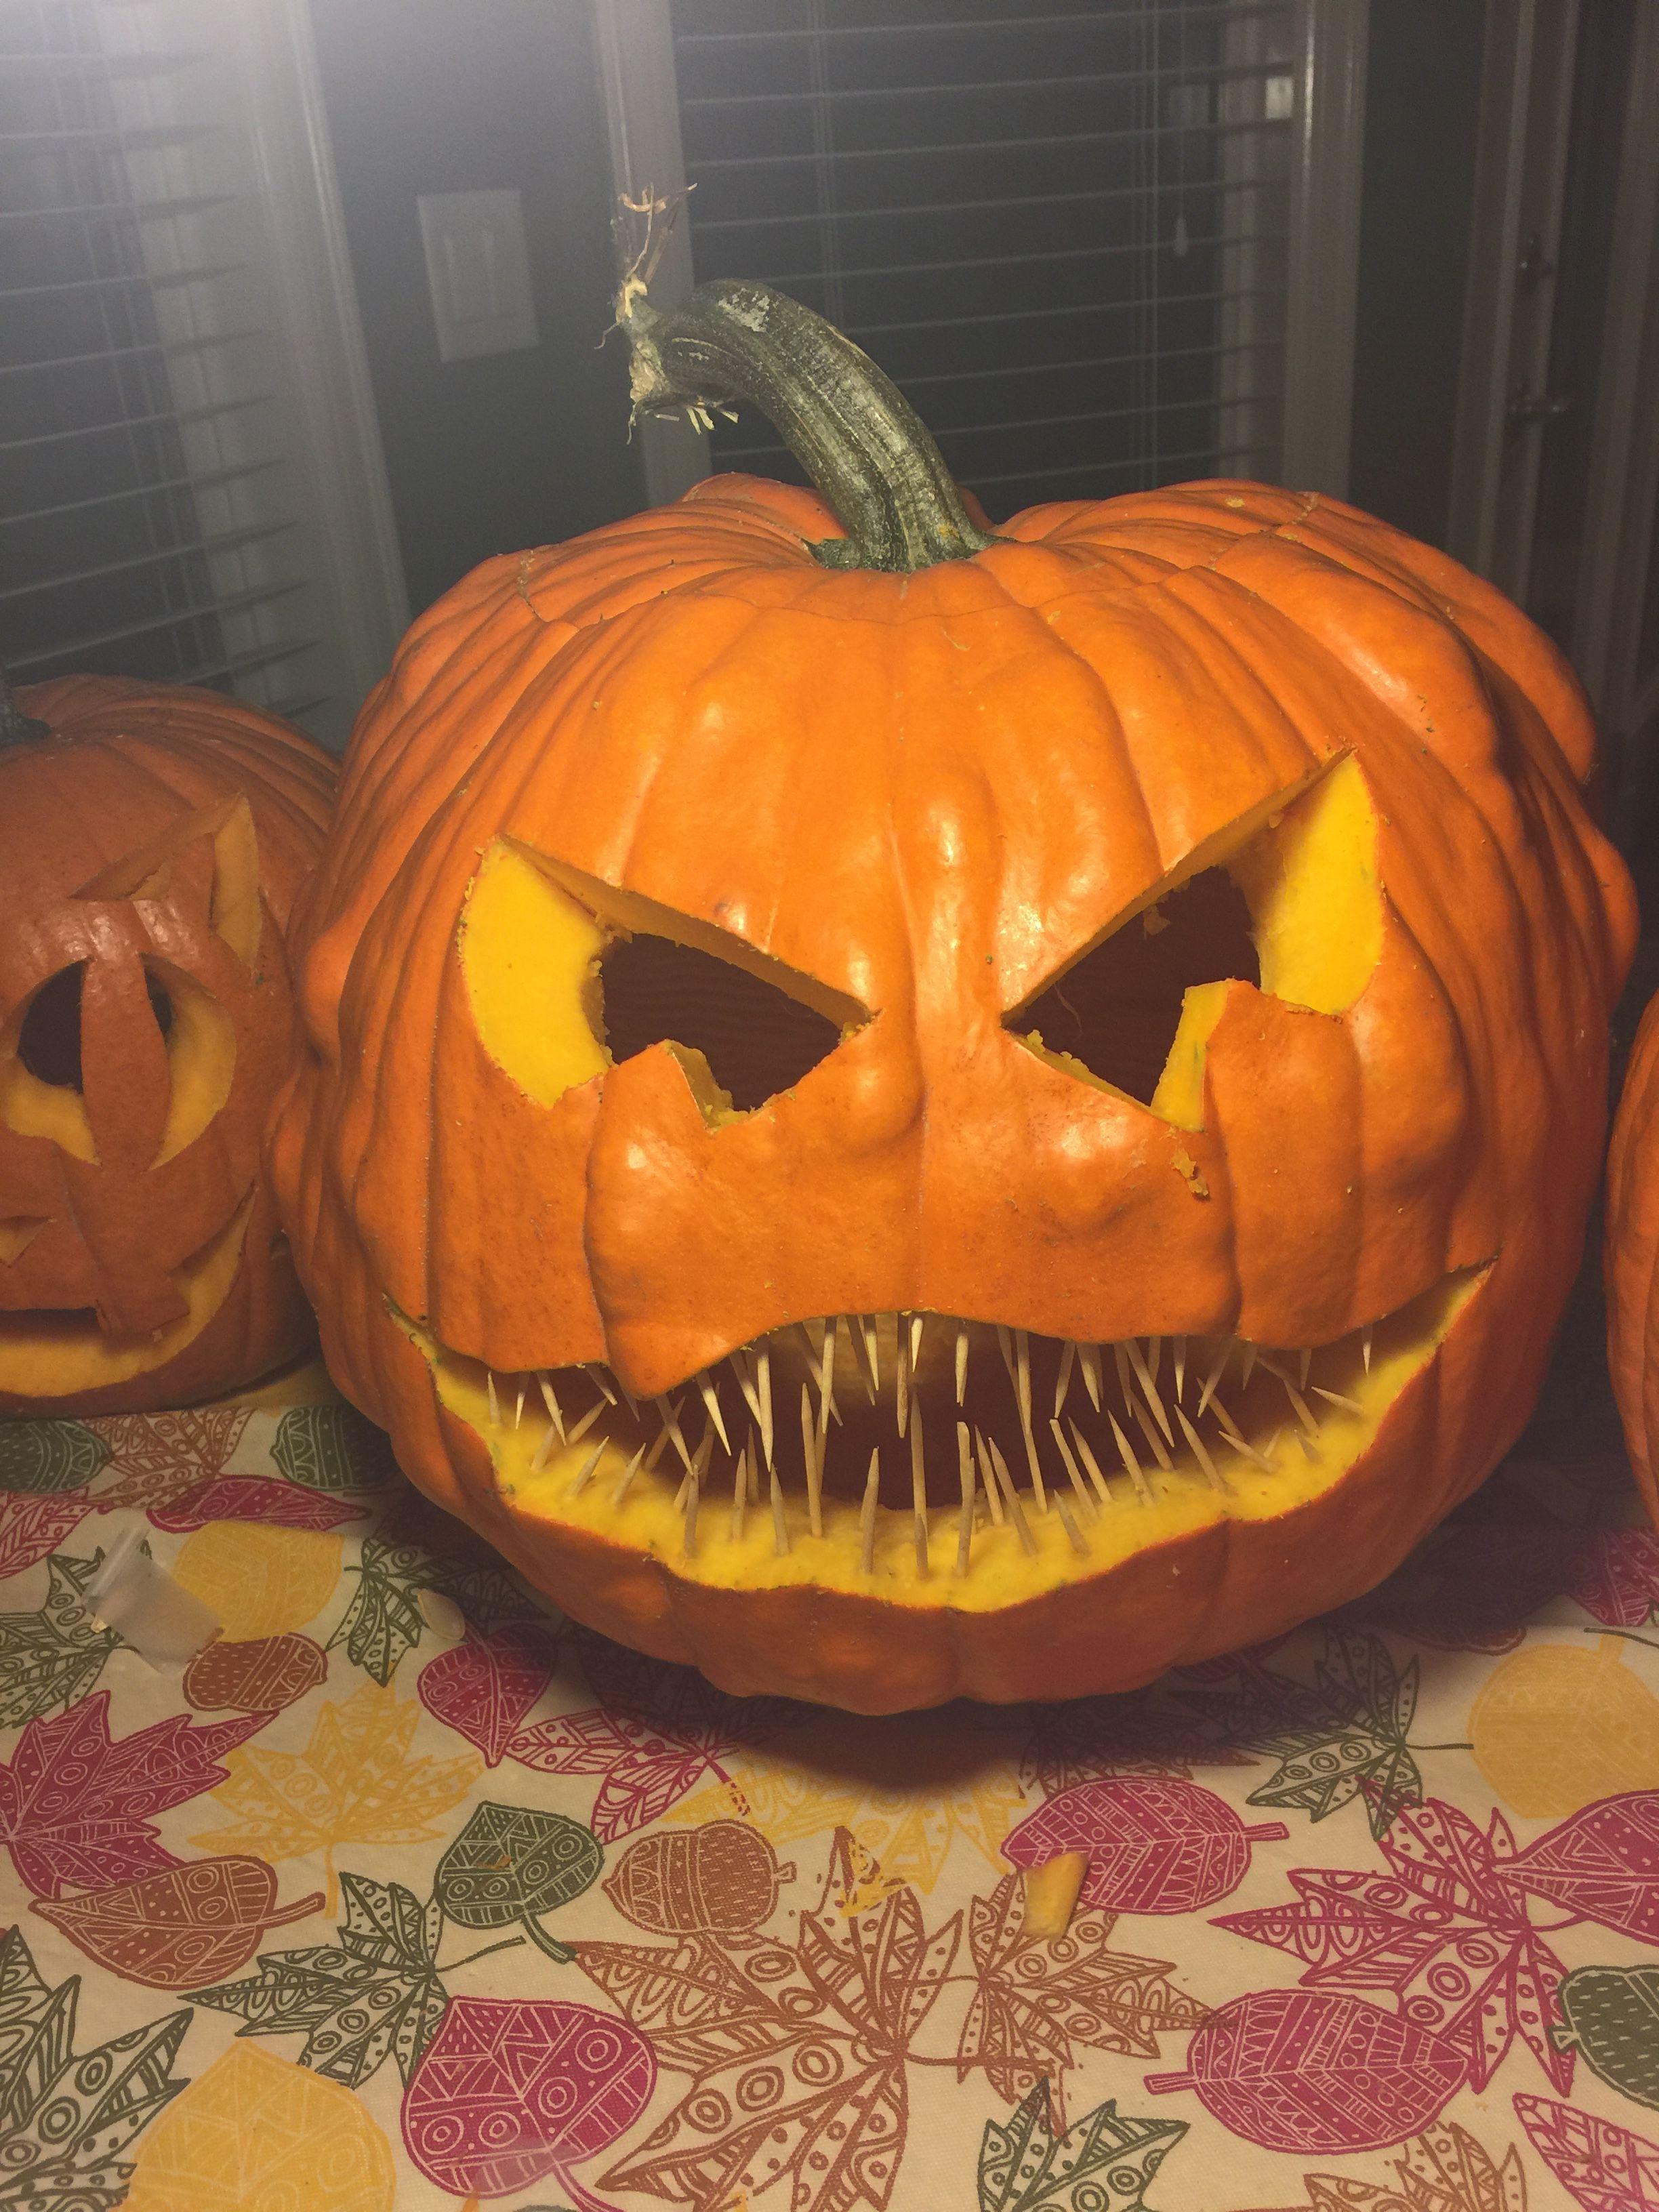 Easy pumpkin carving idea with toothpicks. Creative